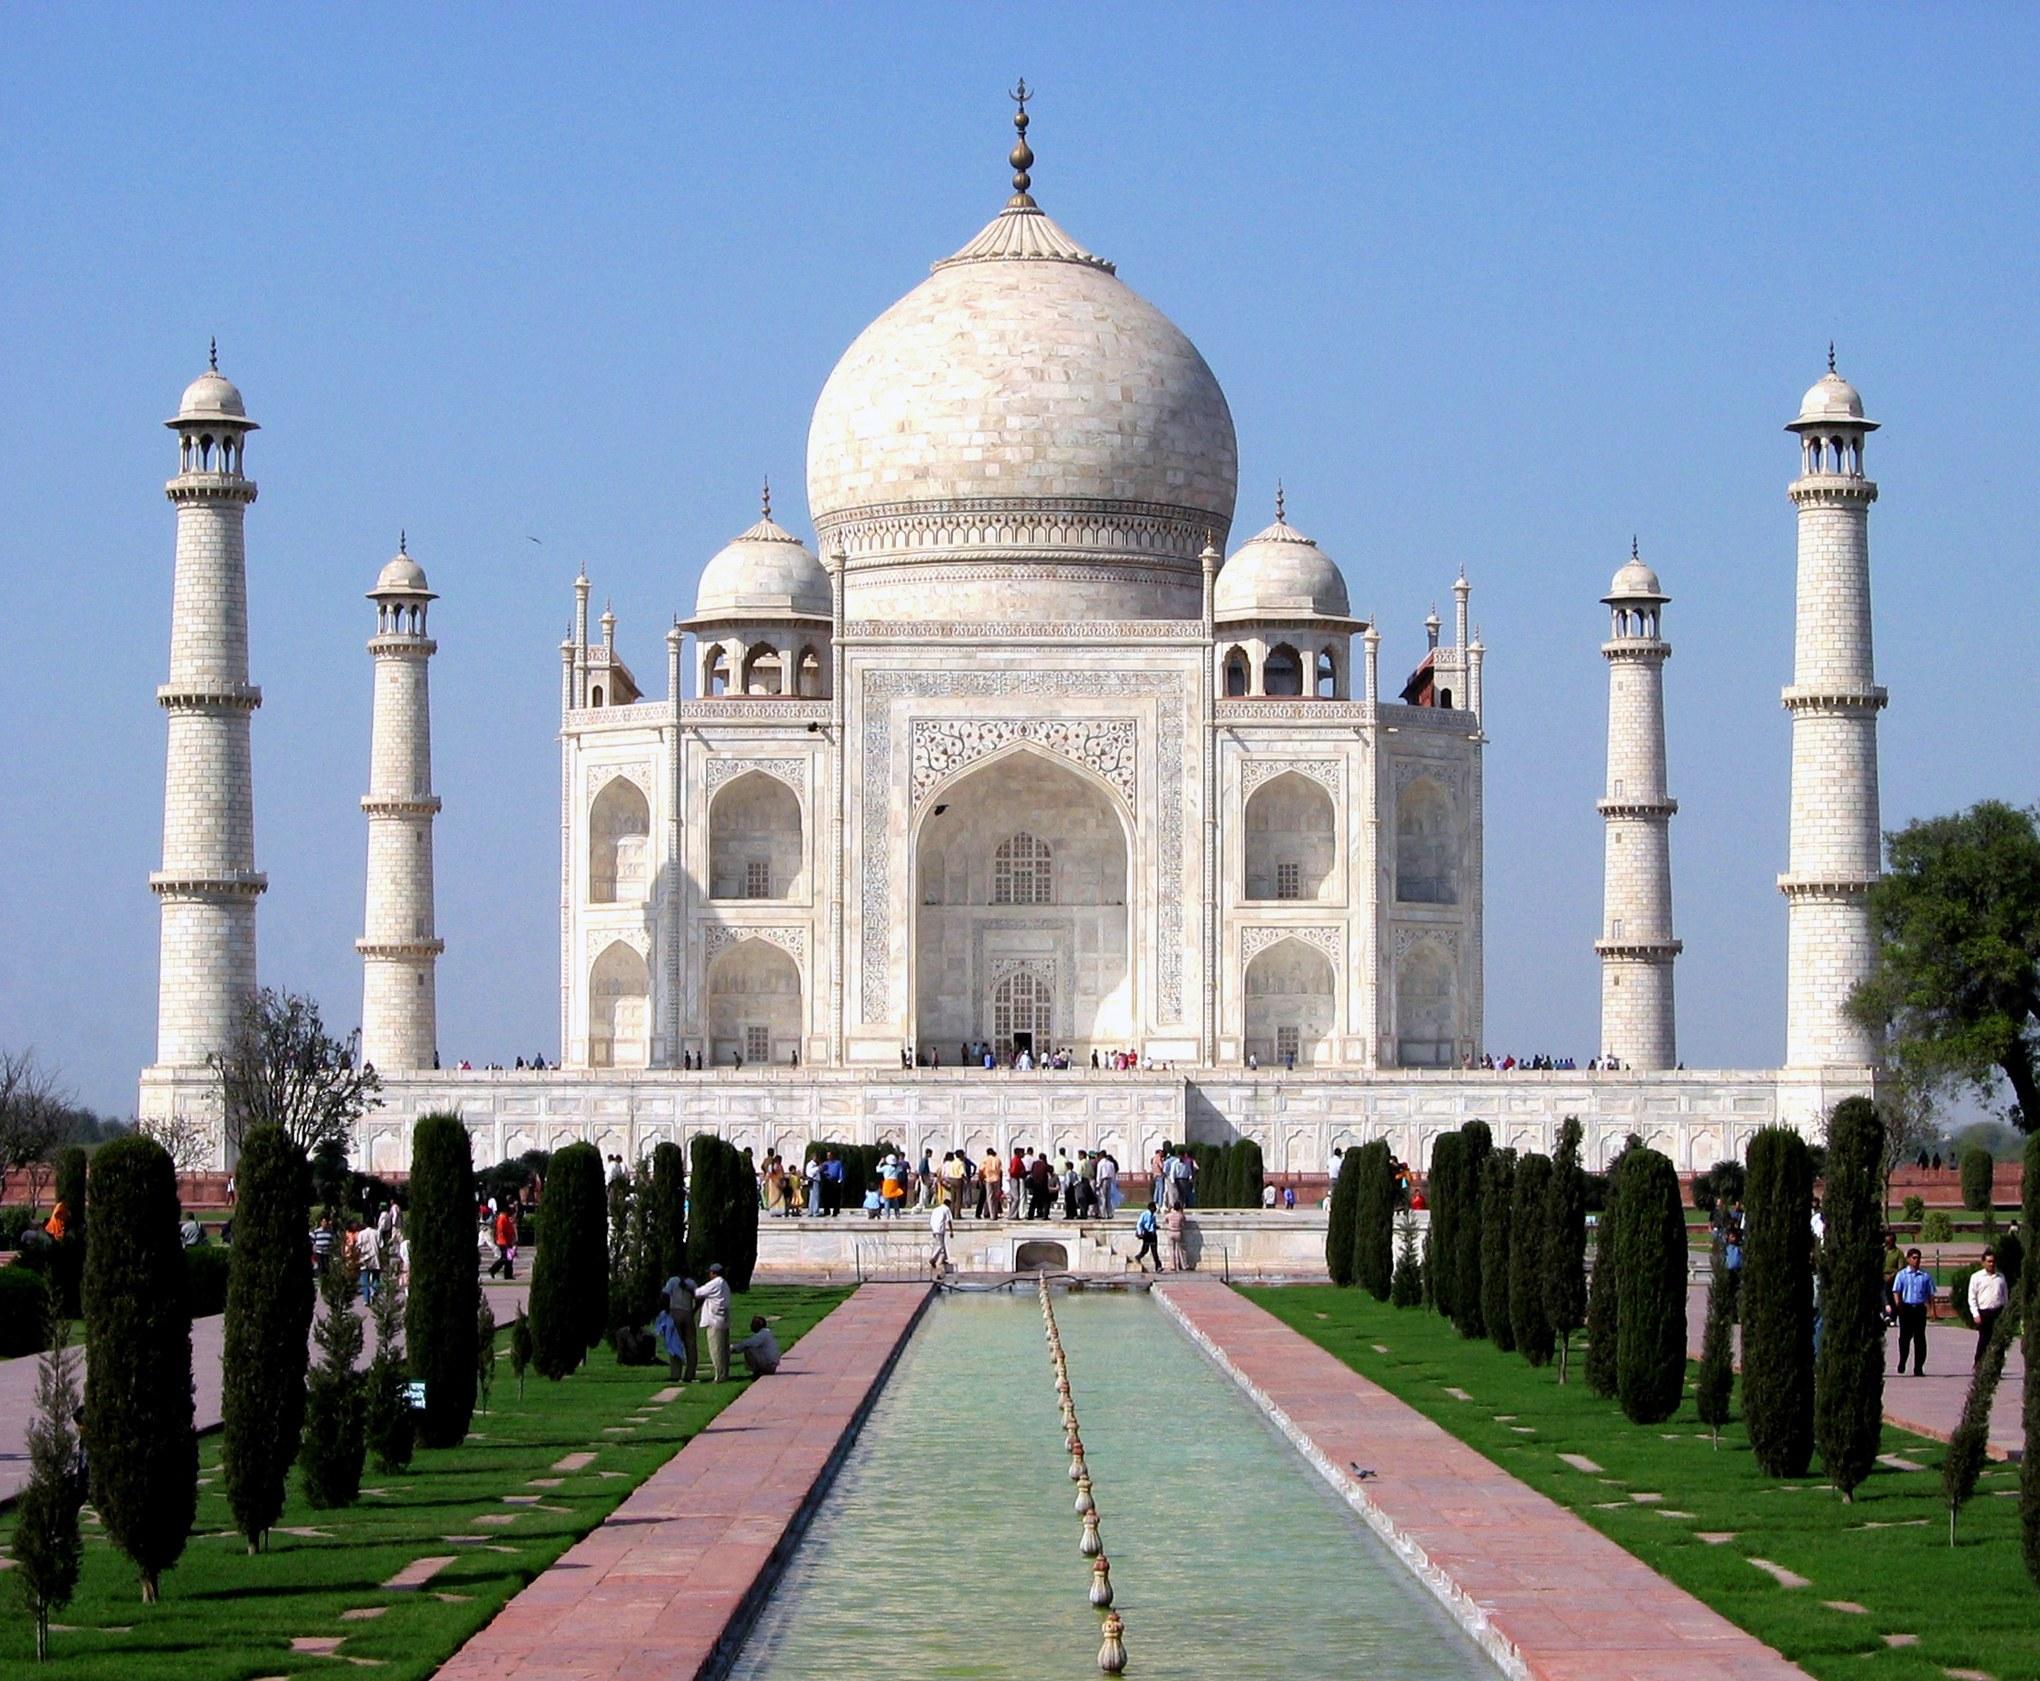 Explore the beauty of the Taj Mahal